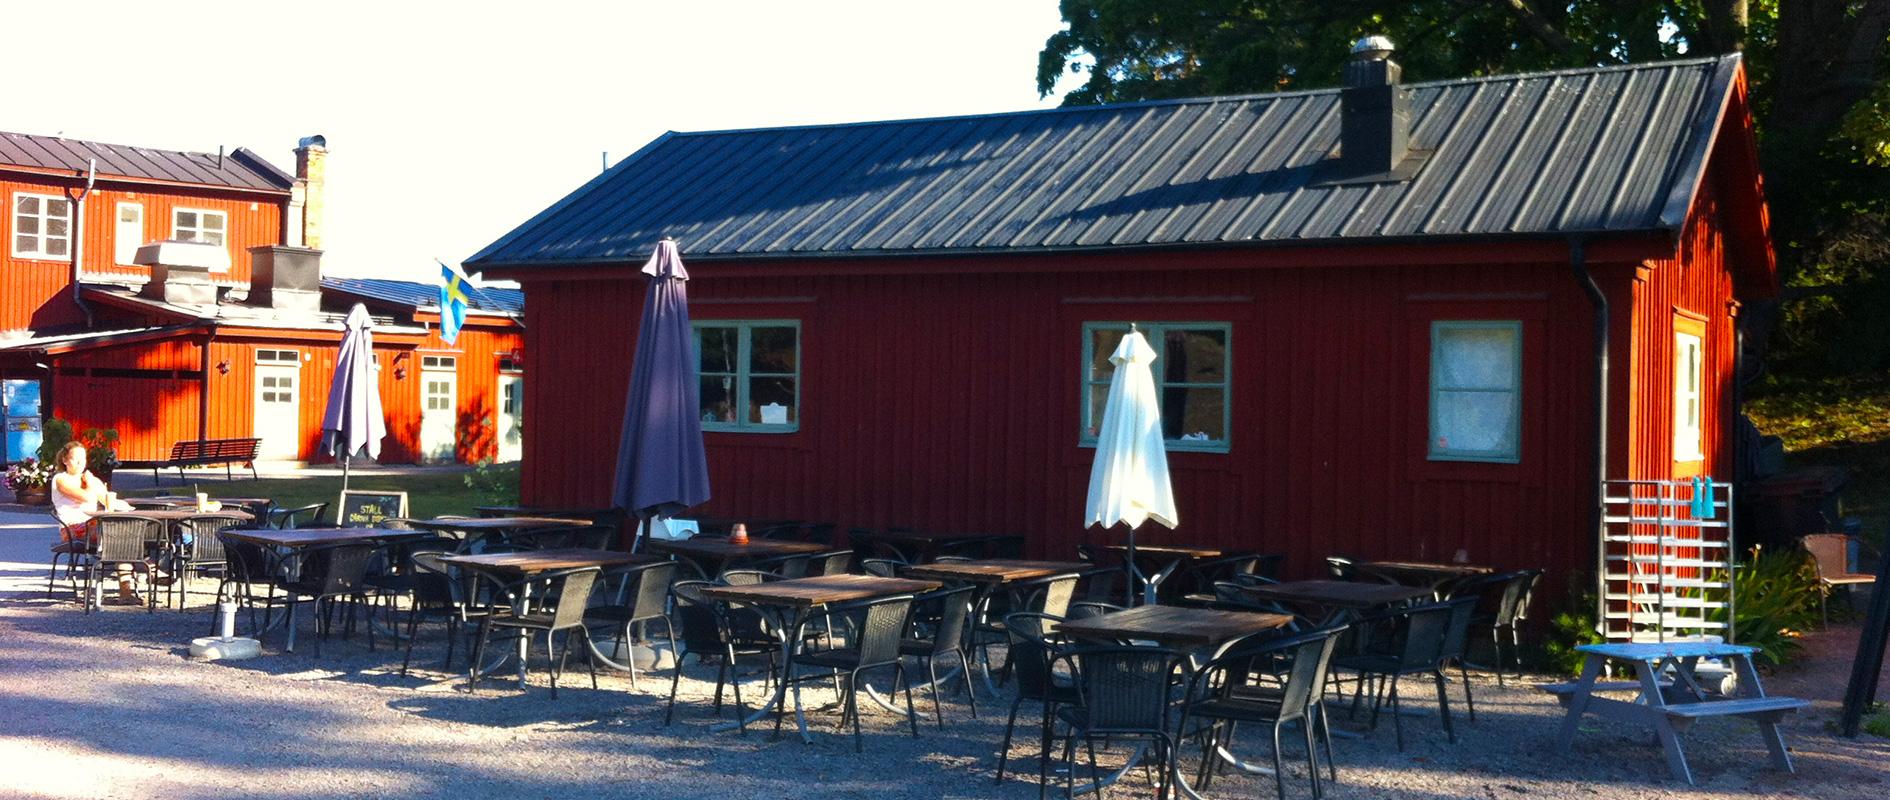 (Image from http://www.systrarnadegen.se)